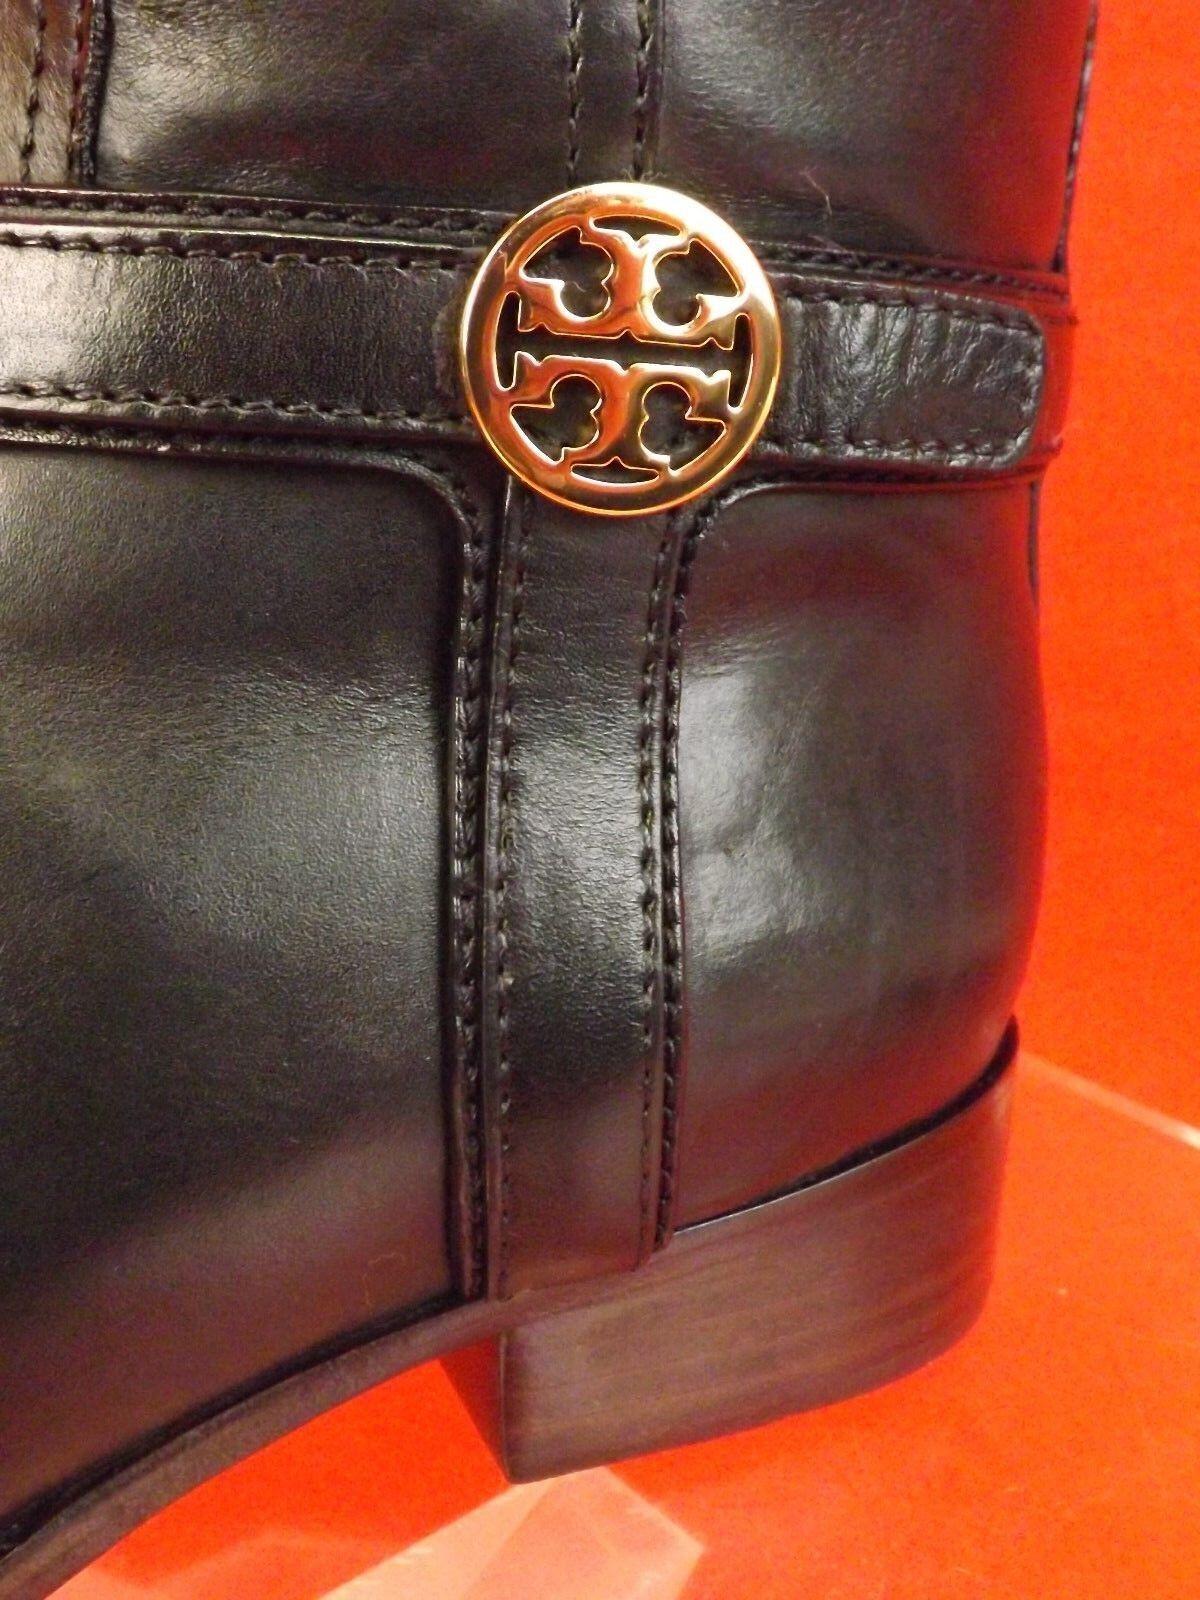 New New New in Box Tory Burch Bristol Cuir Noir Or Reva Tall Harnais Équitation Bottes 8.5 ac23f7